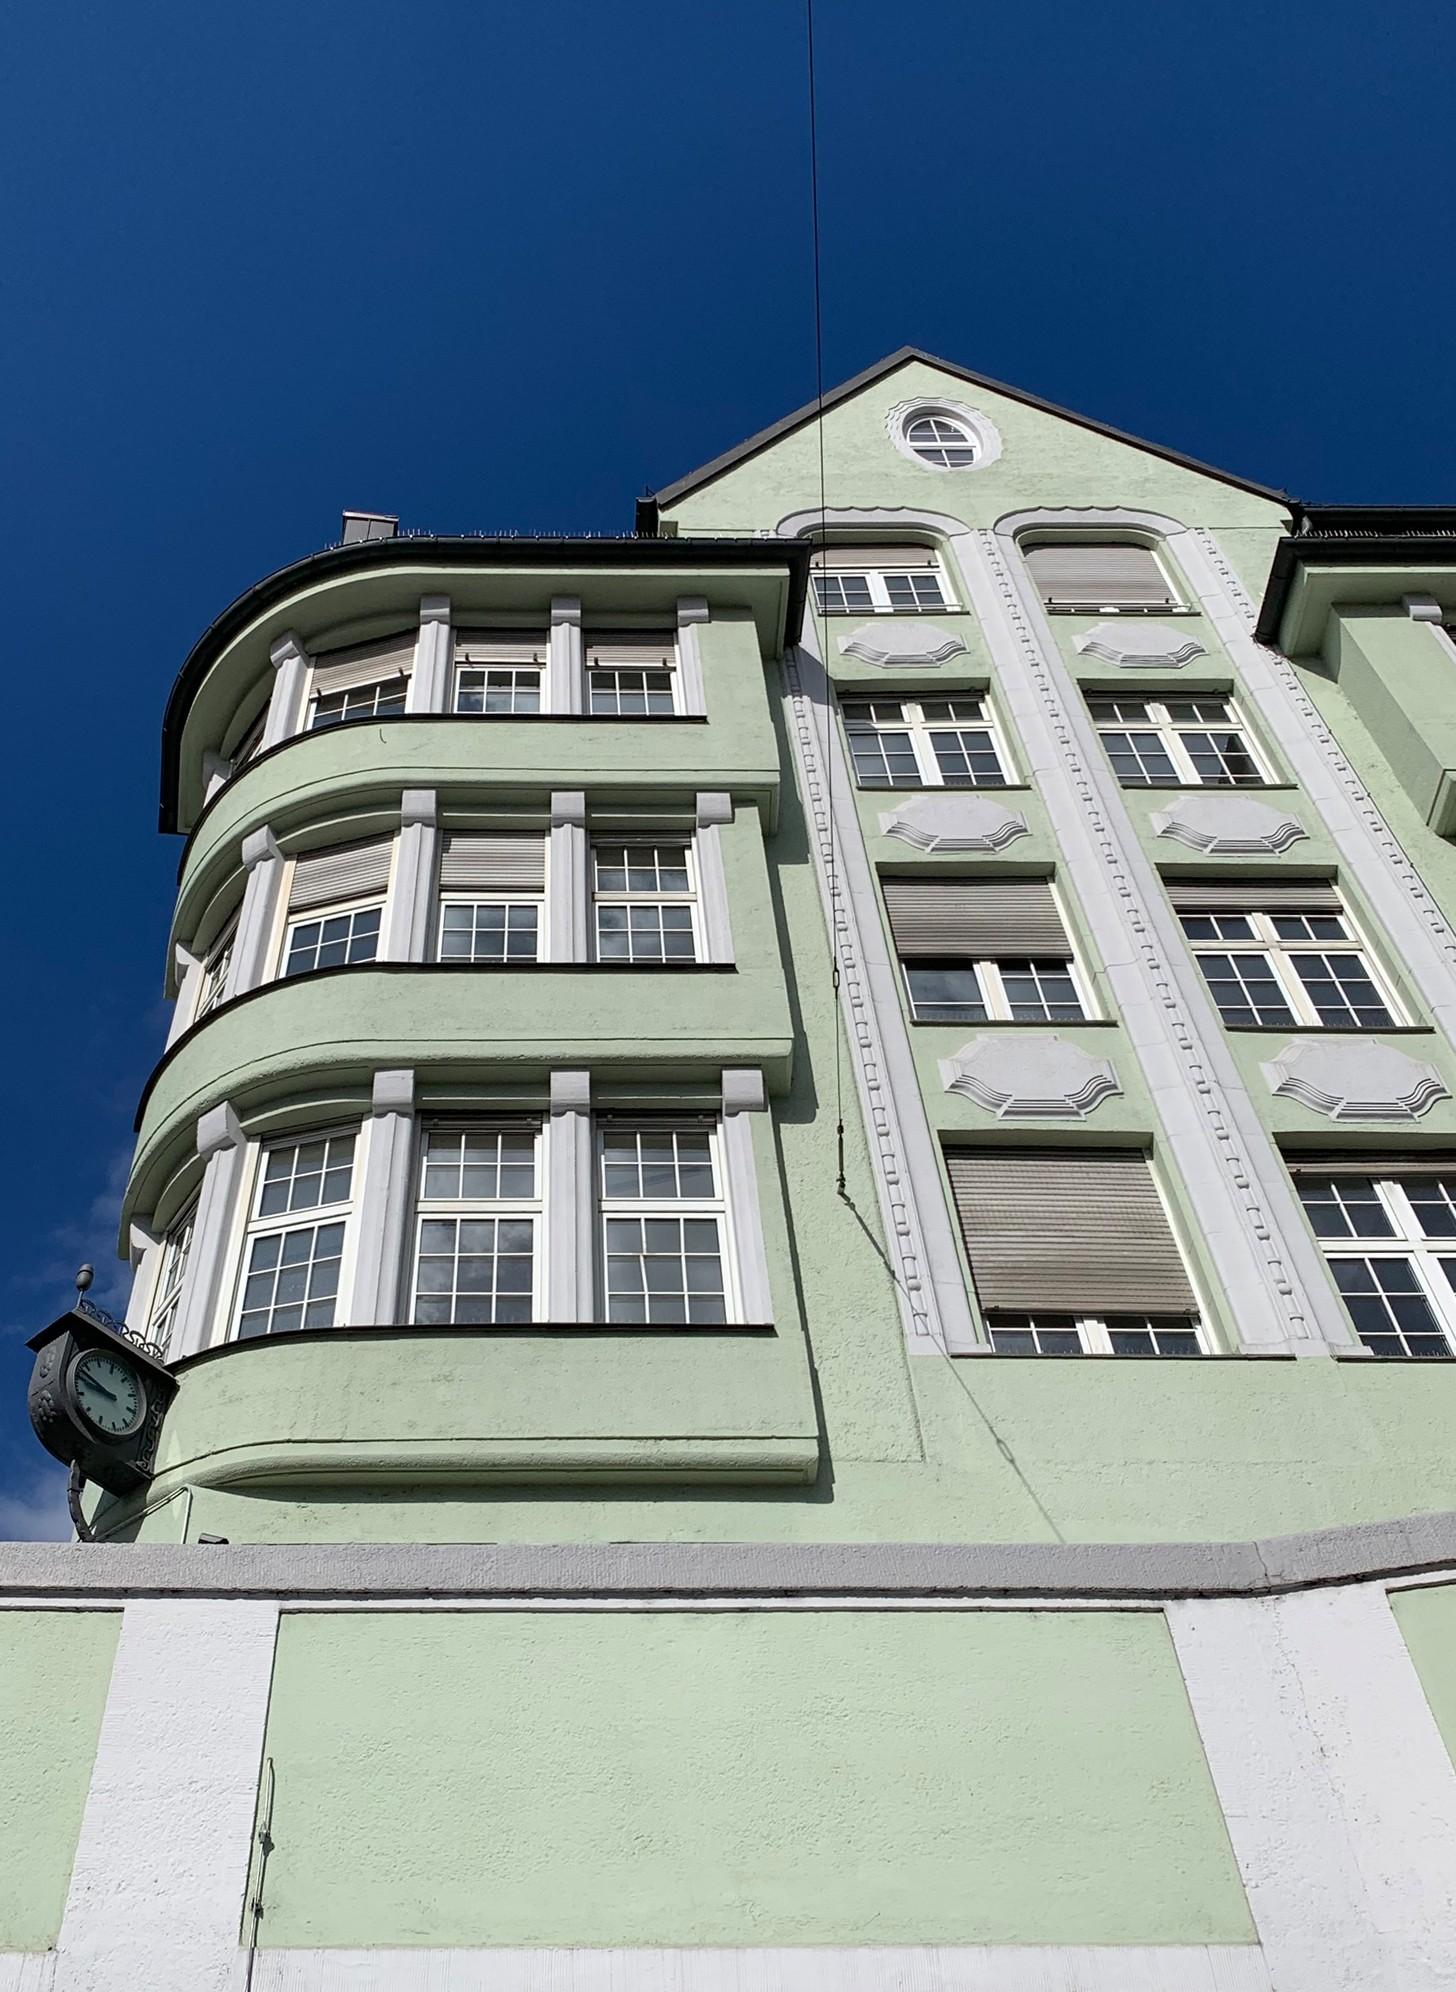 Lindwurmhof, 1910-1912. Architect: Franz Rank